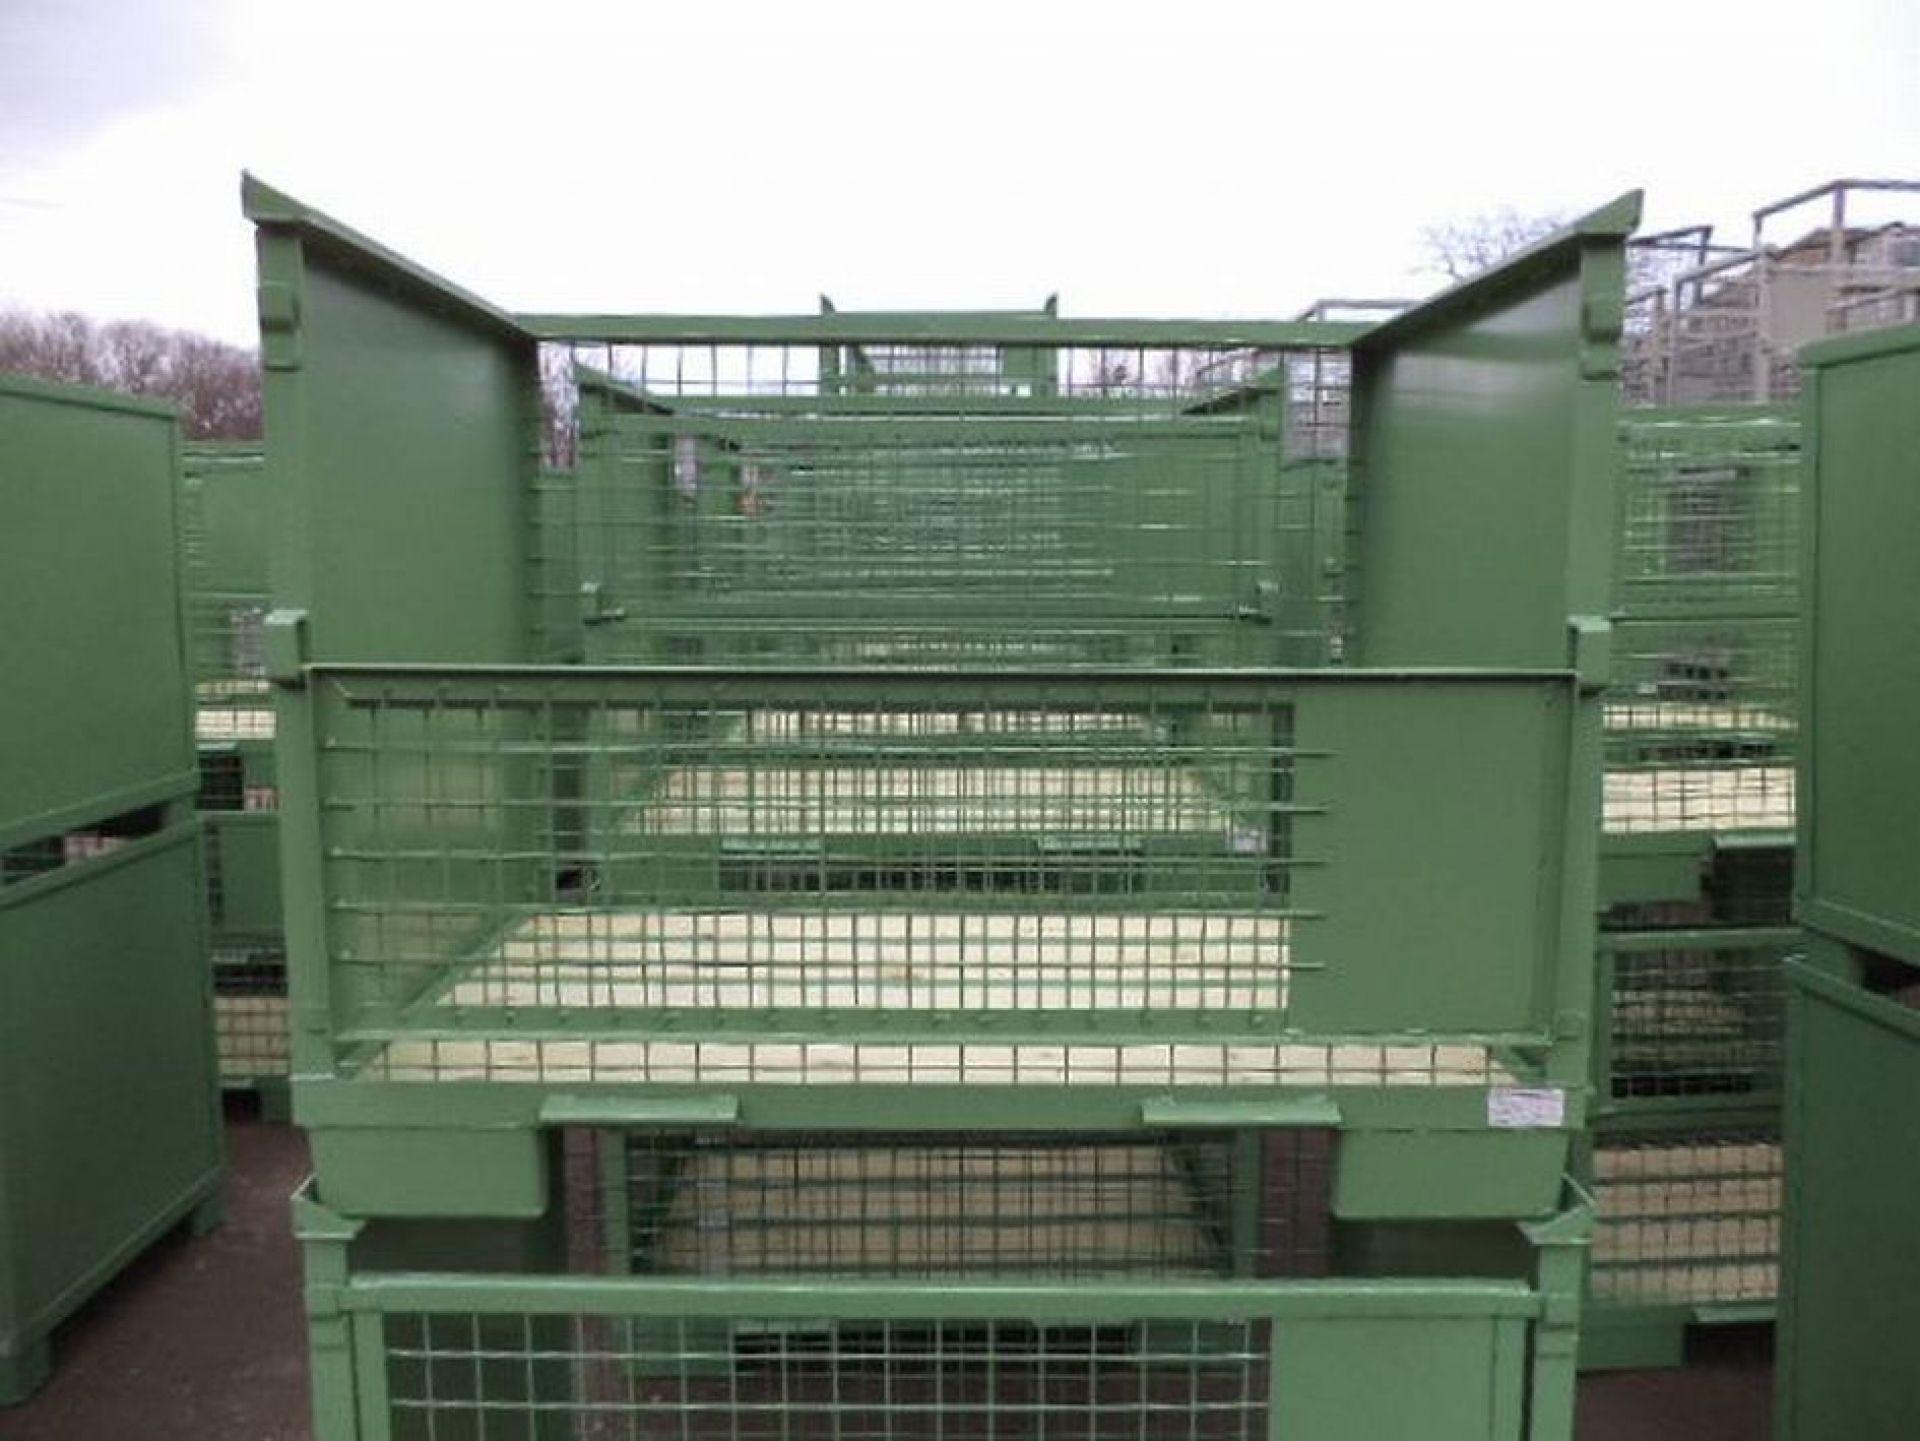 Gitterbehälter mit Blechwänden